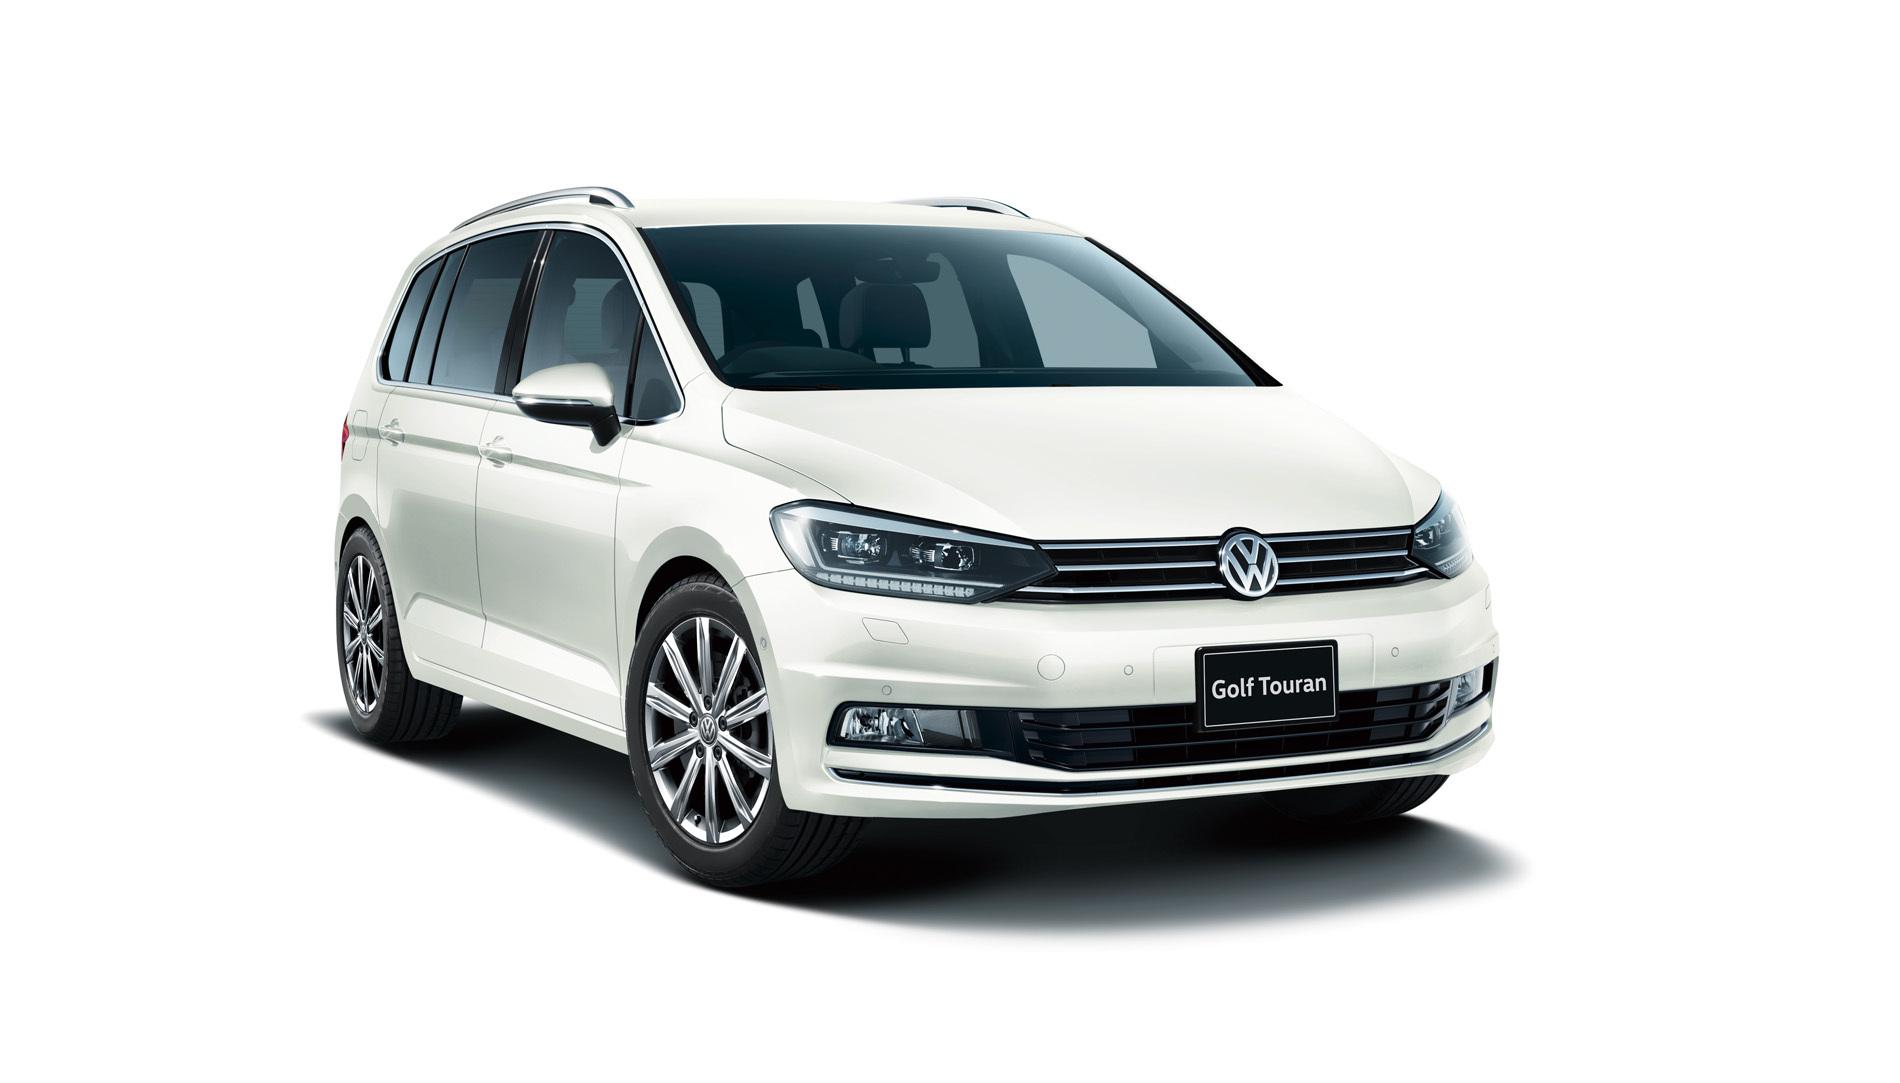 VW・ゴルフトゥーラン、テクノロジーパッケージに先進安全装備「ダイナミックライトアシスト」を追加